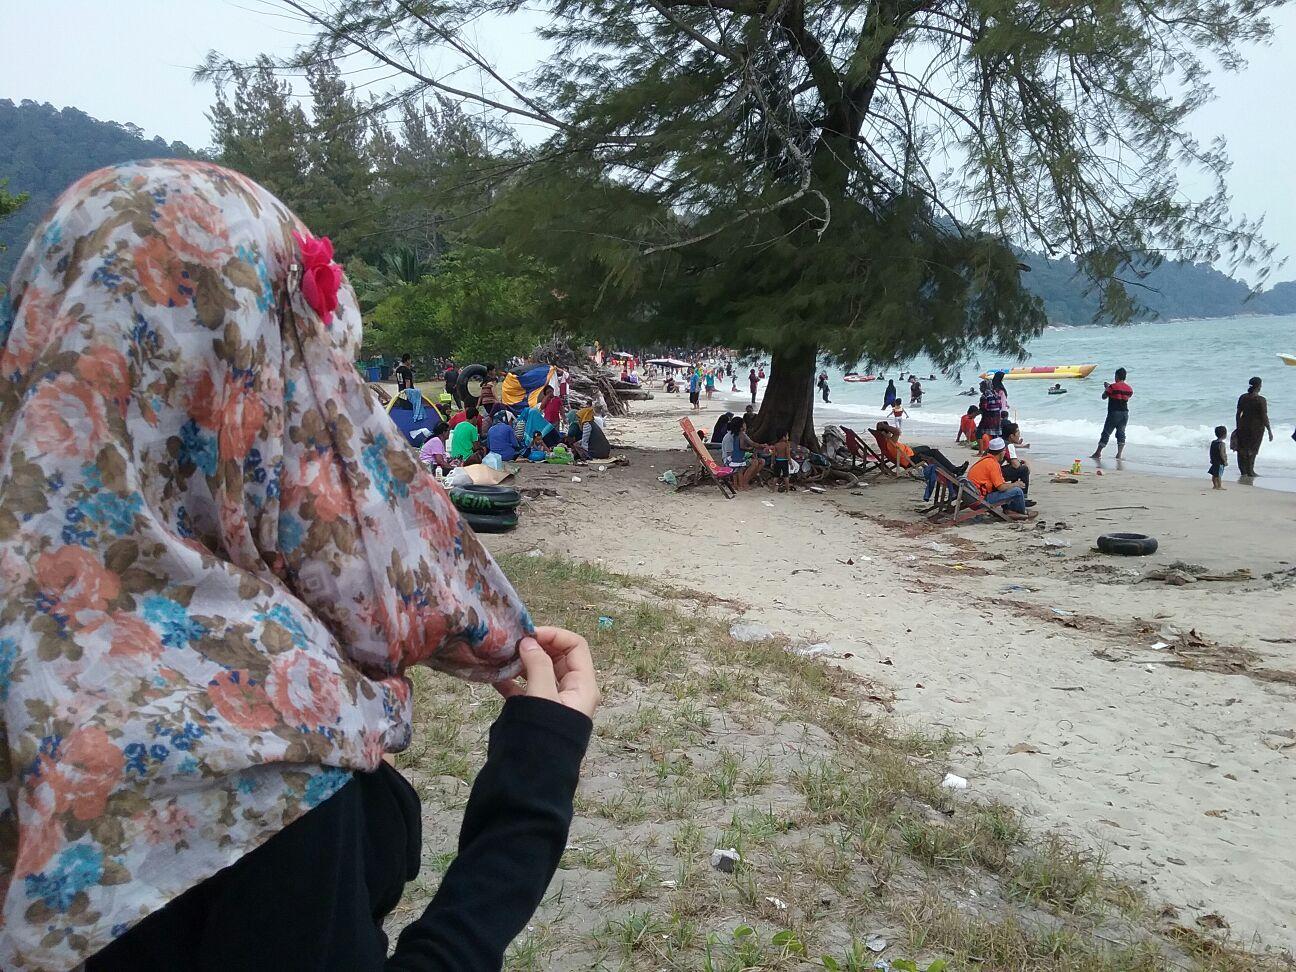 teluk intan single jewish girls Teluk intan joined  girls, cari lelaki yang  islamophobia is now so rife that even jewish rabbis have been subjected to anti-muslim hate.